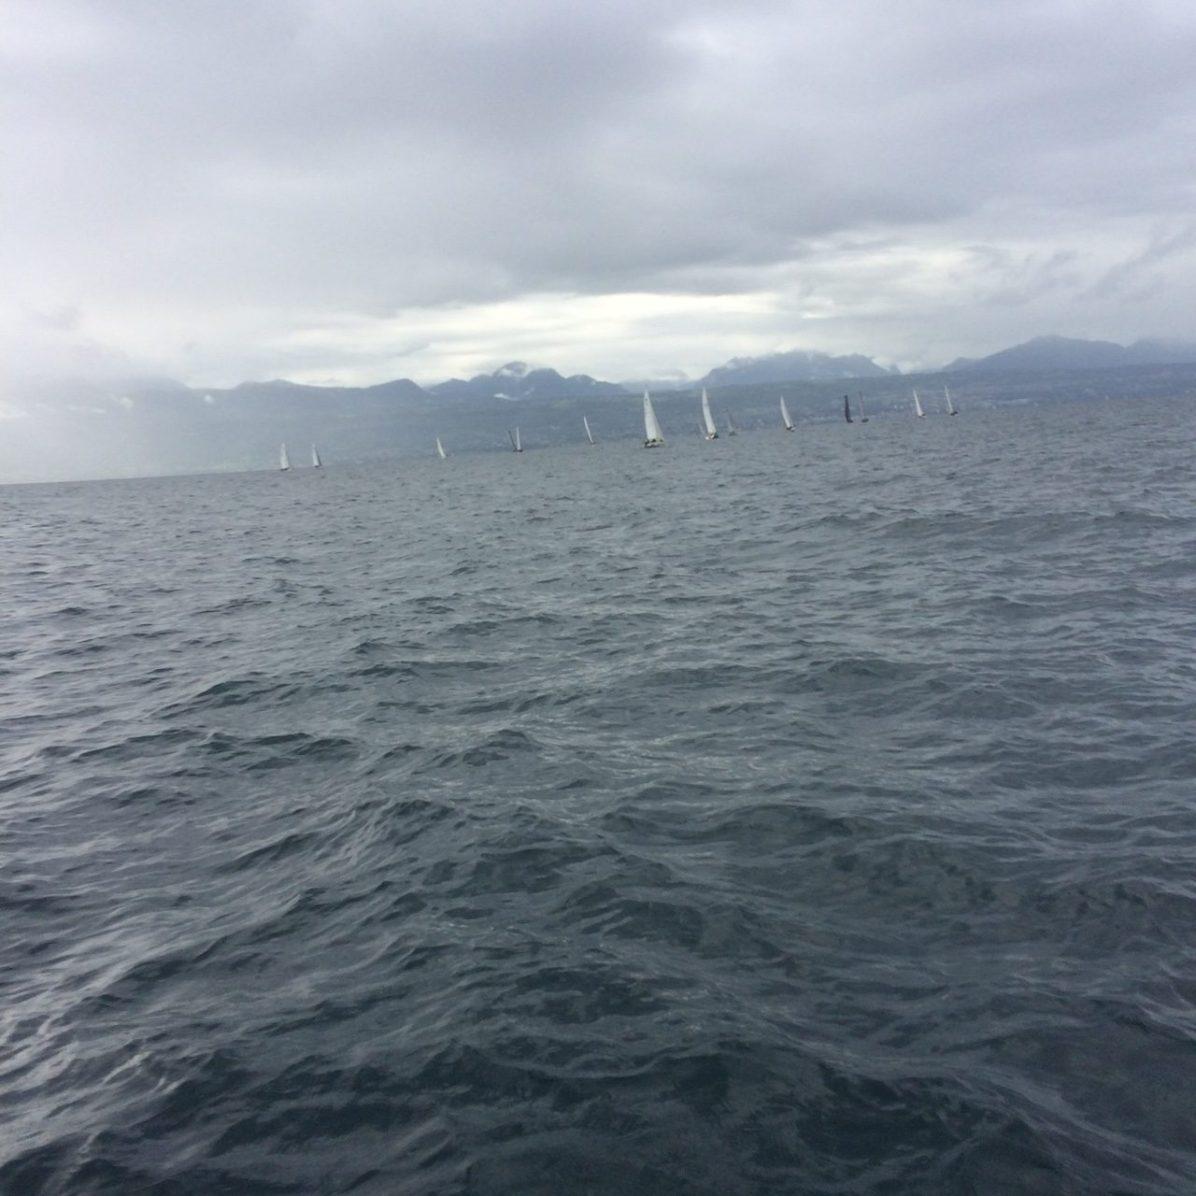 Flotte Ruban Bleu 2019